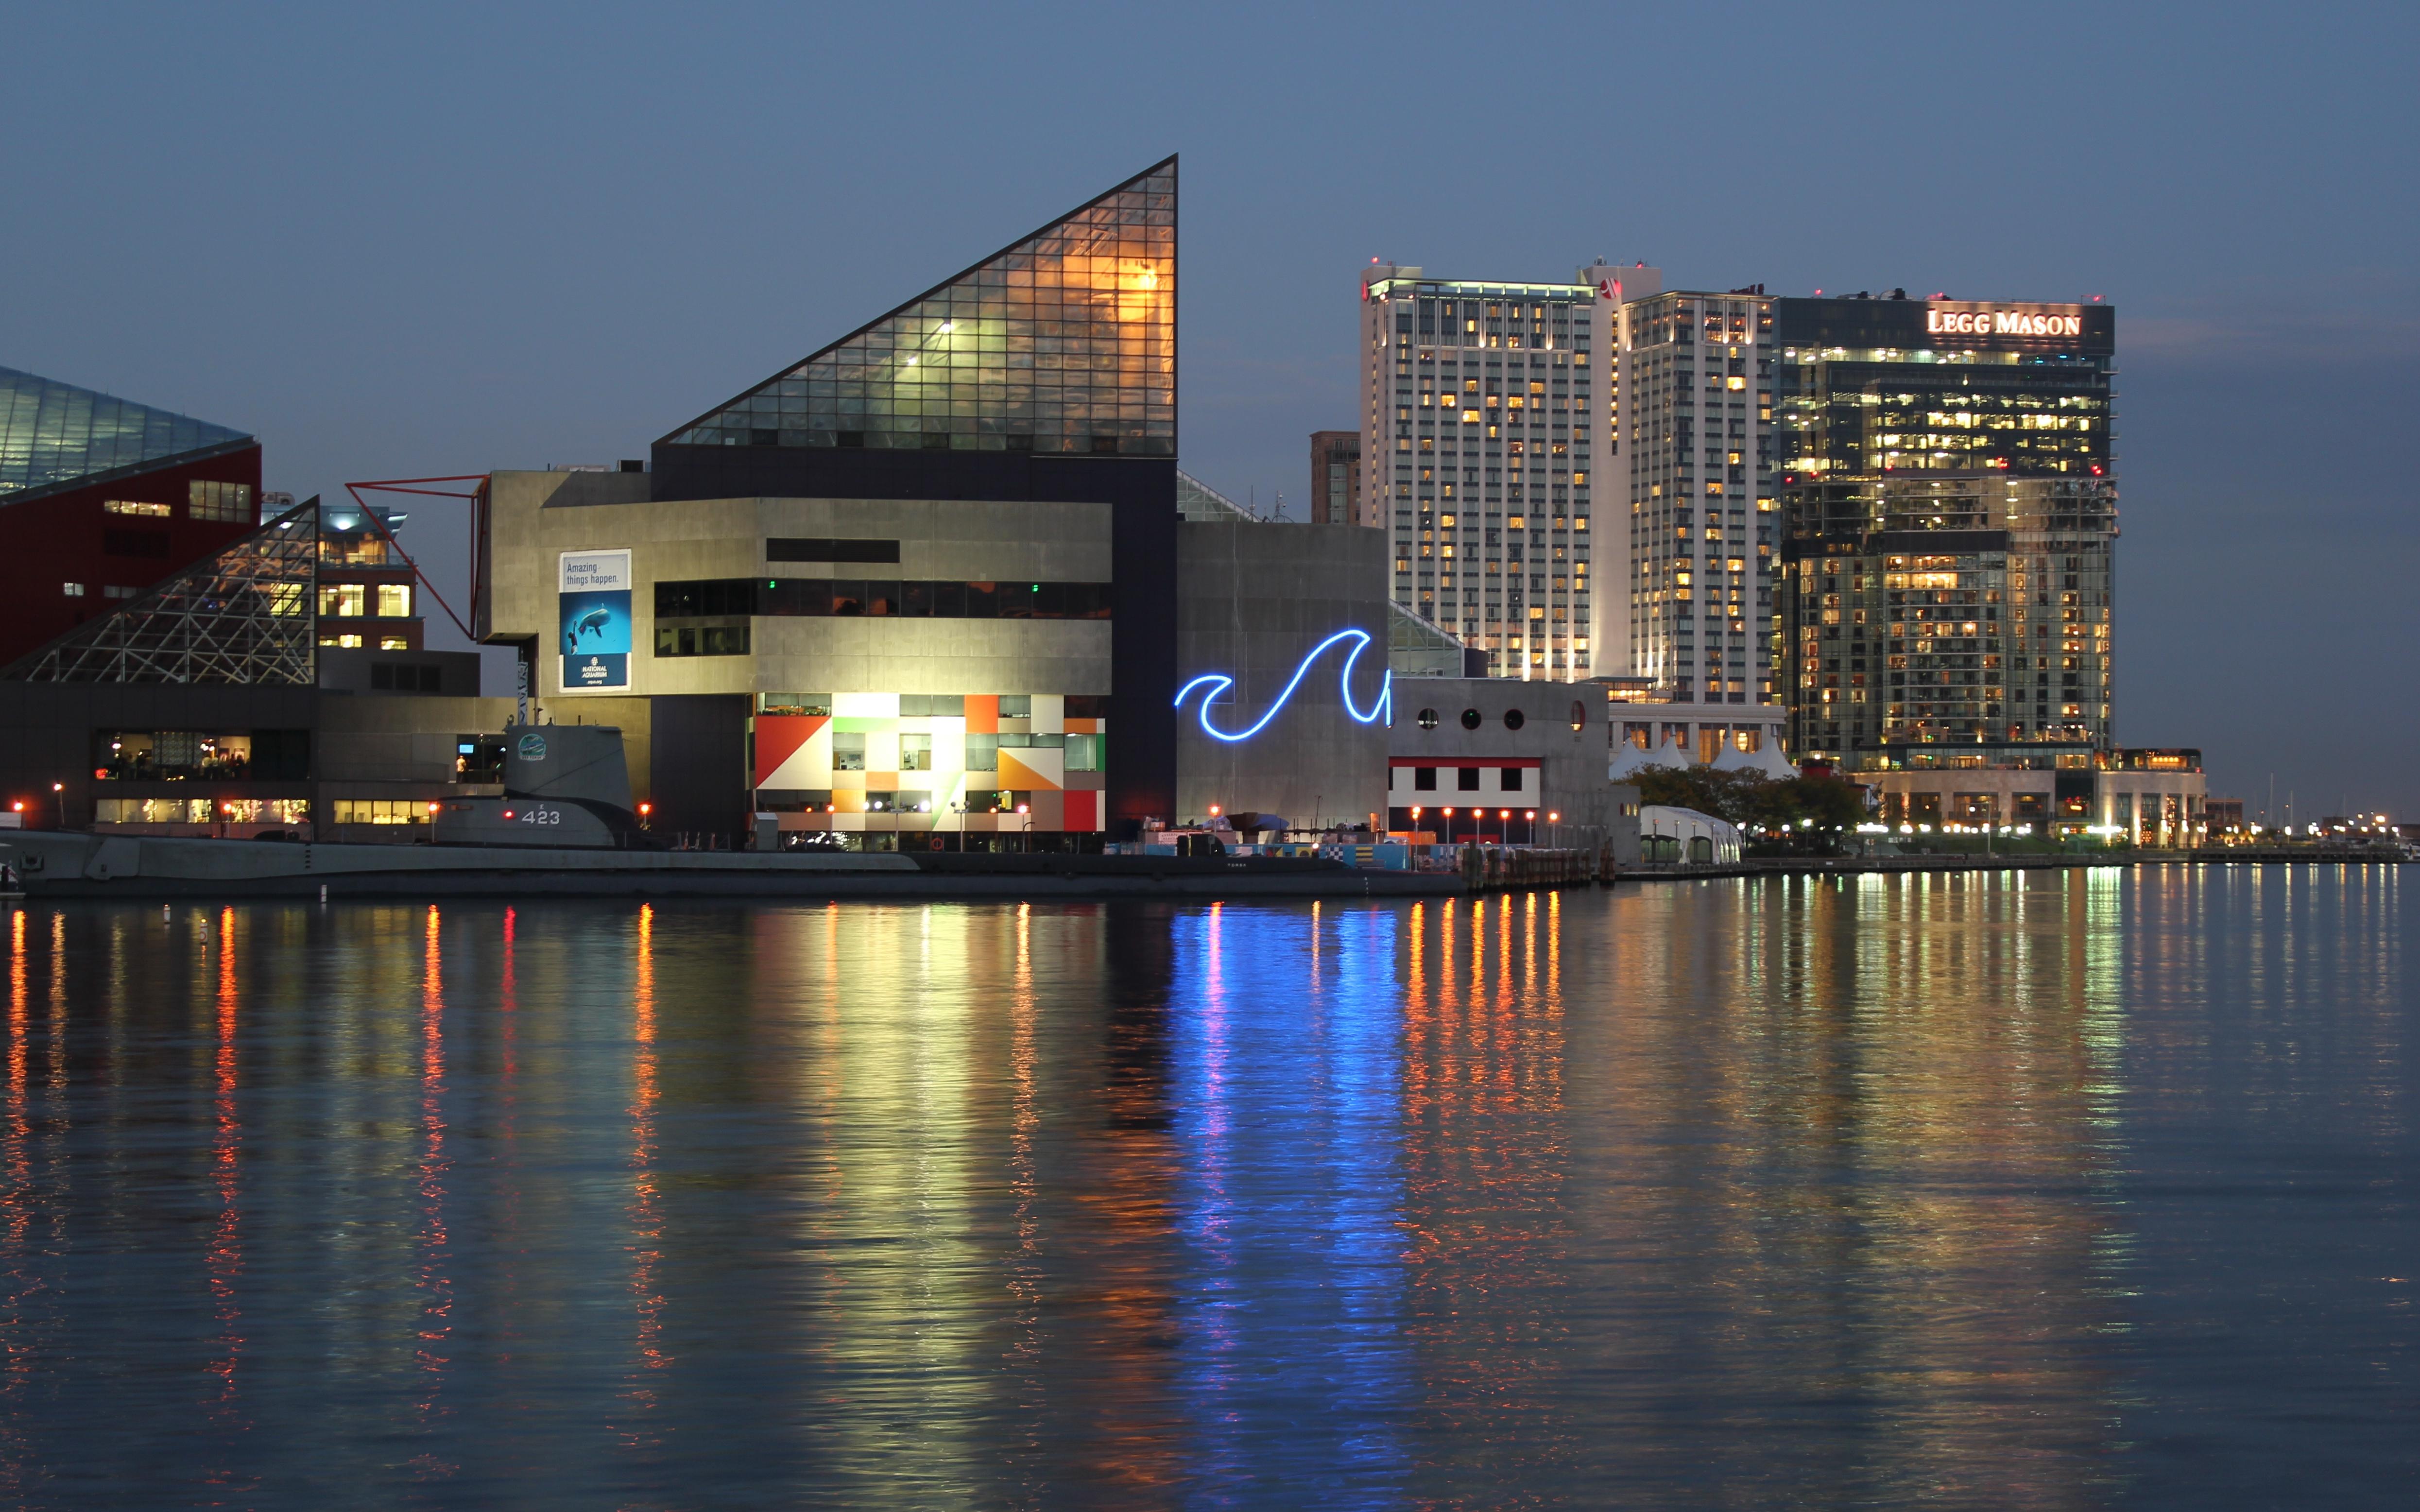 National Aquarium Baltimore | Shutterbug